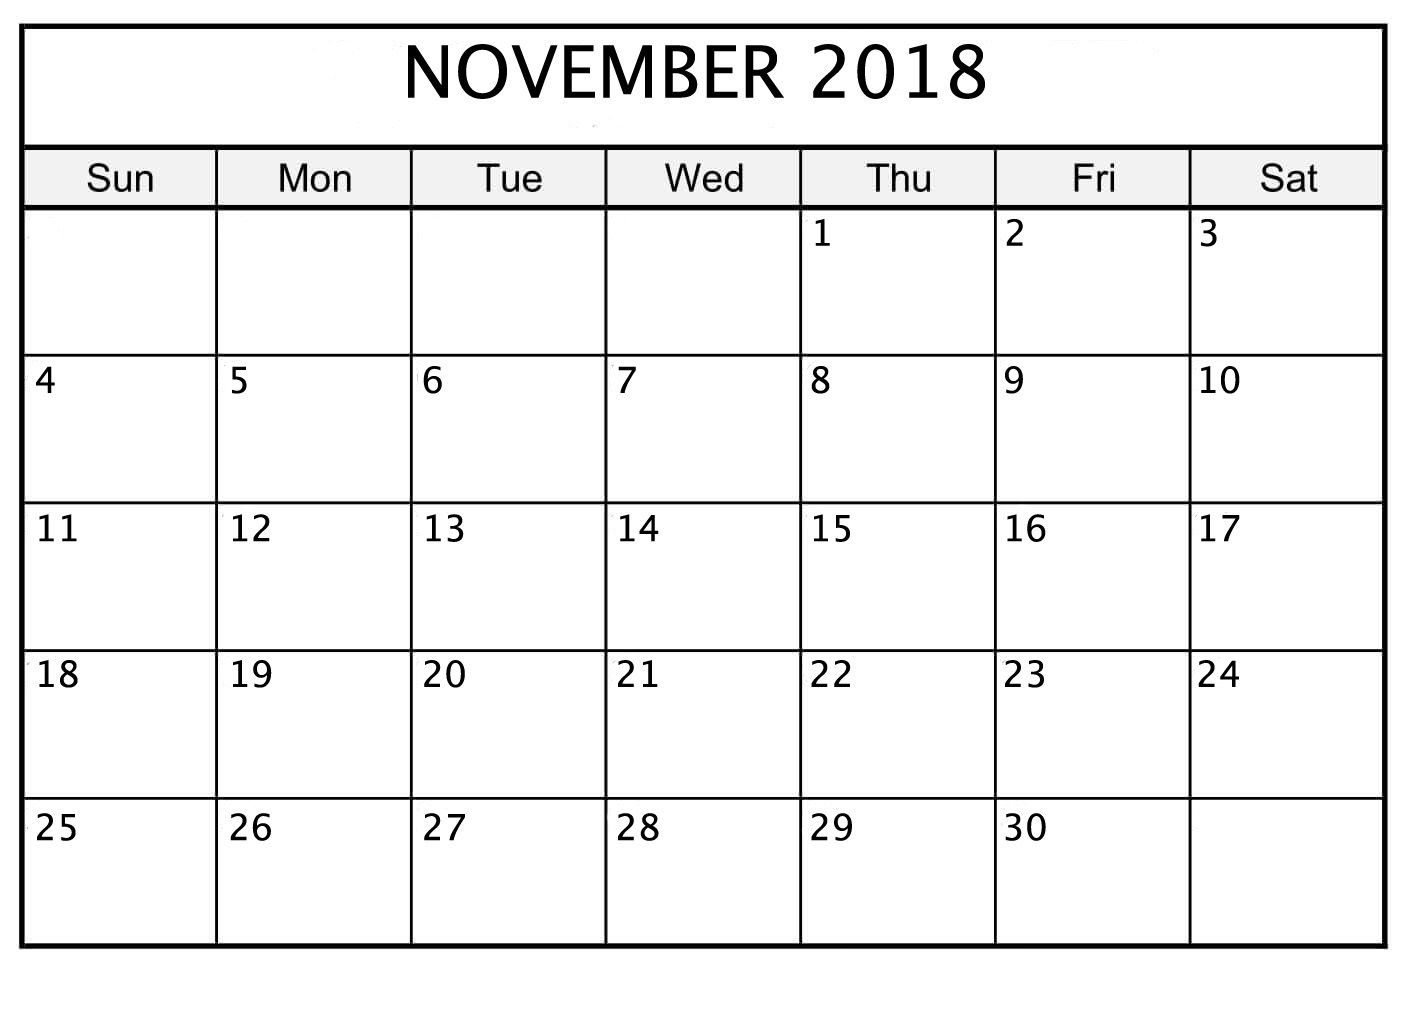 image regarding November Calendar Printable known as Absolutely free Calendar Style November 2018 Printable November 2018